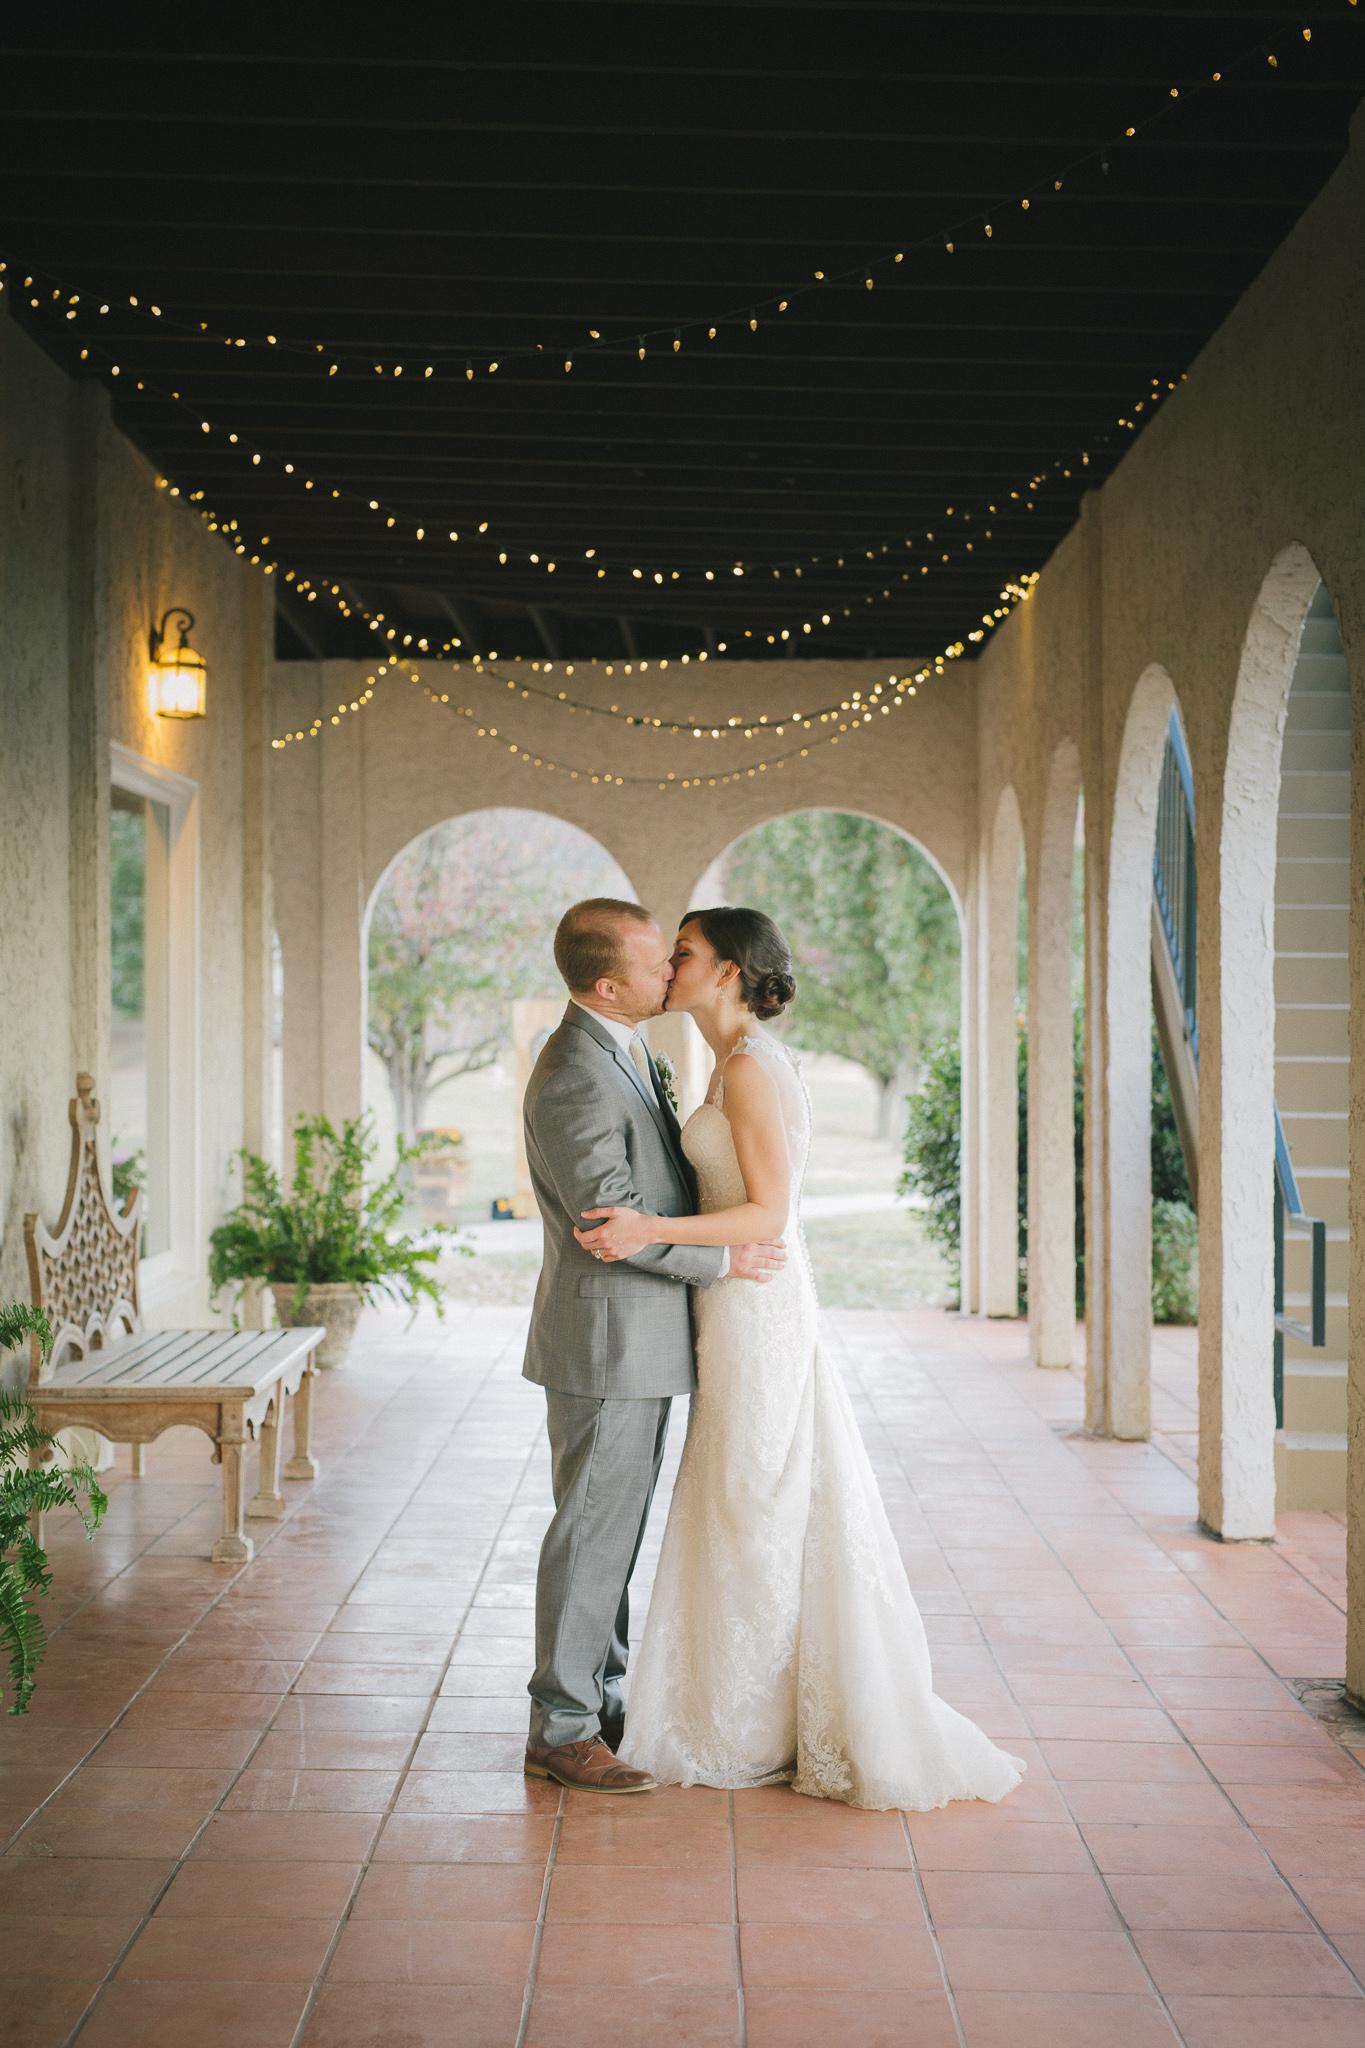 chattanooga-wedding-photographer-inimate-beautiful-tennessee-36.jpg